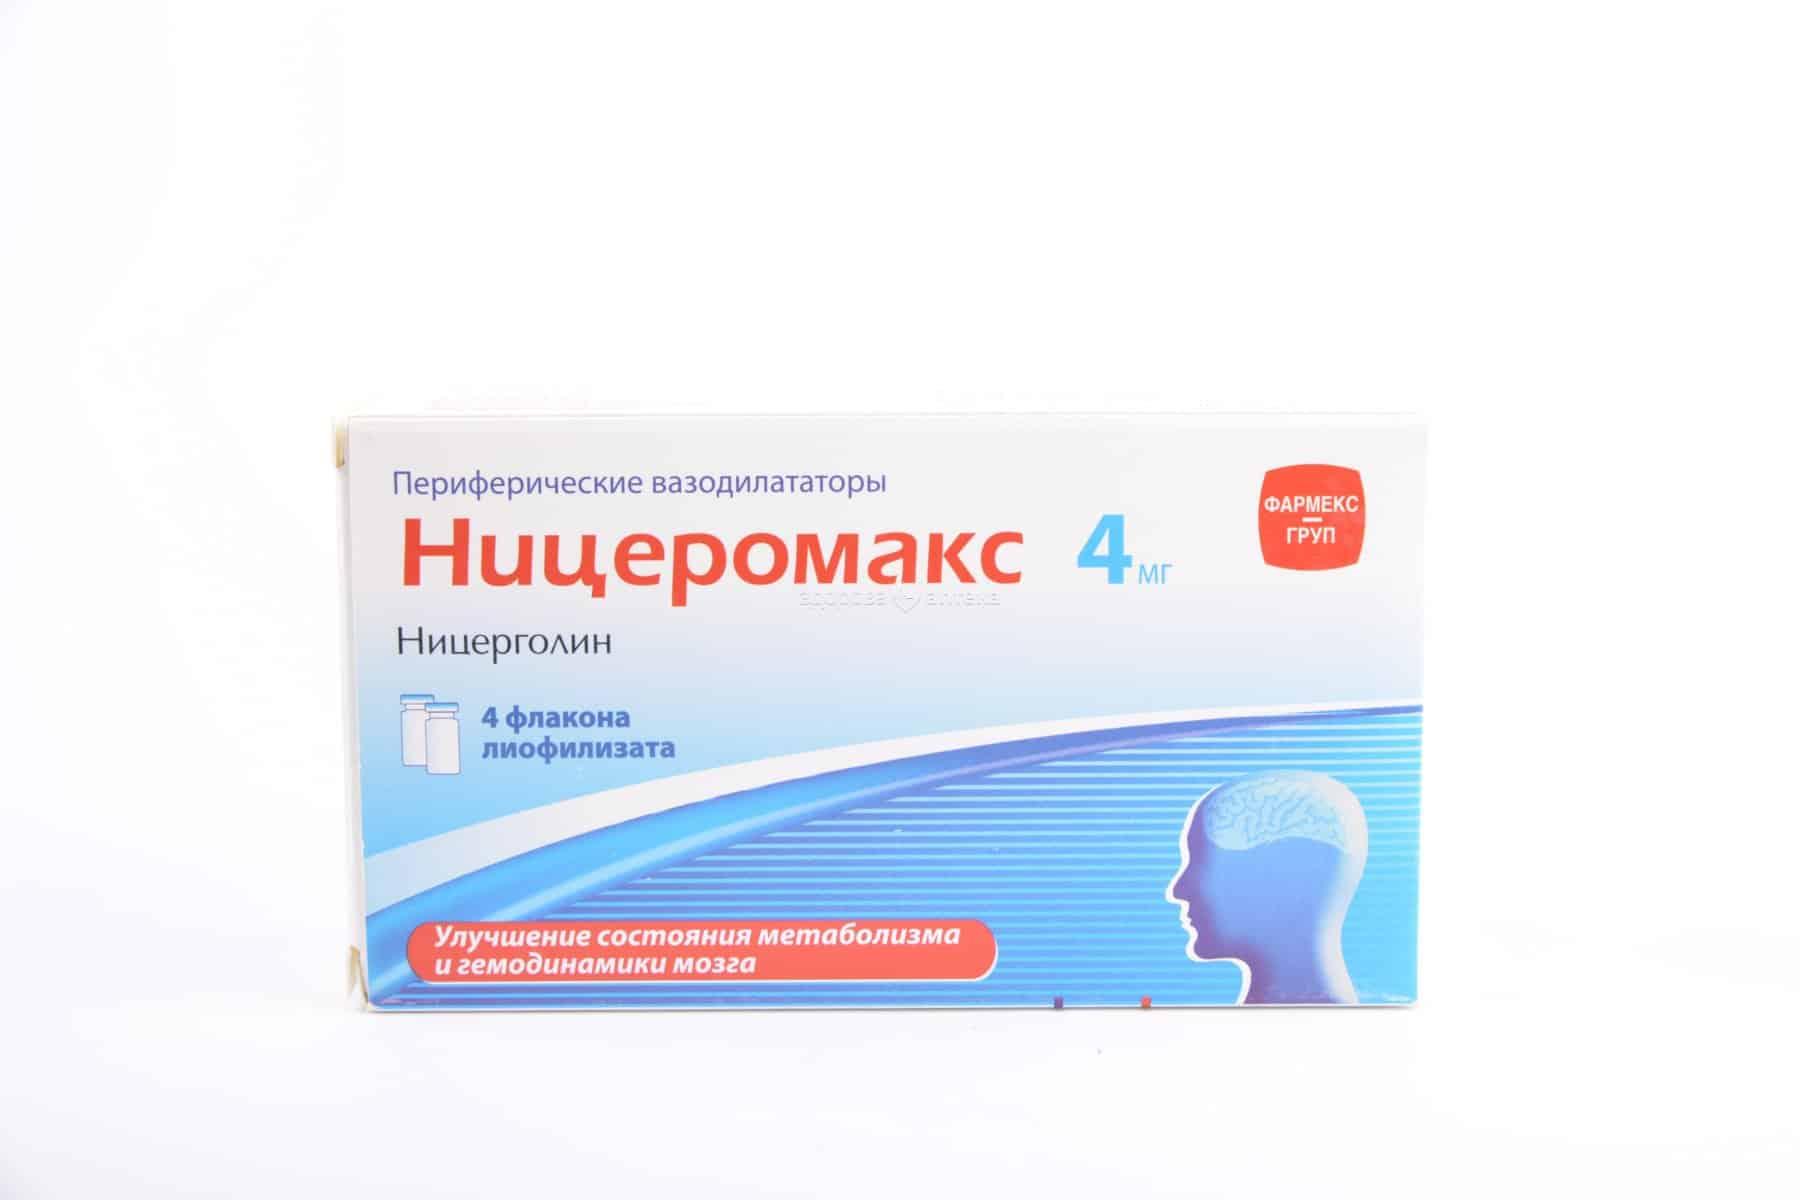 Niceromax (nicergoline) lyophilisate for solution for injections 4 mg. №4 vial